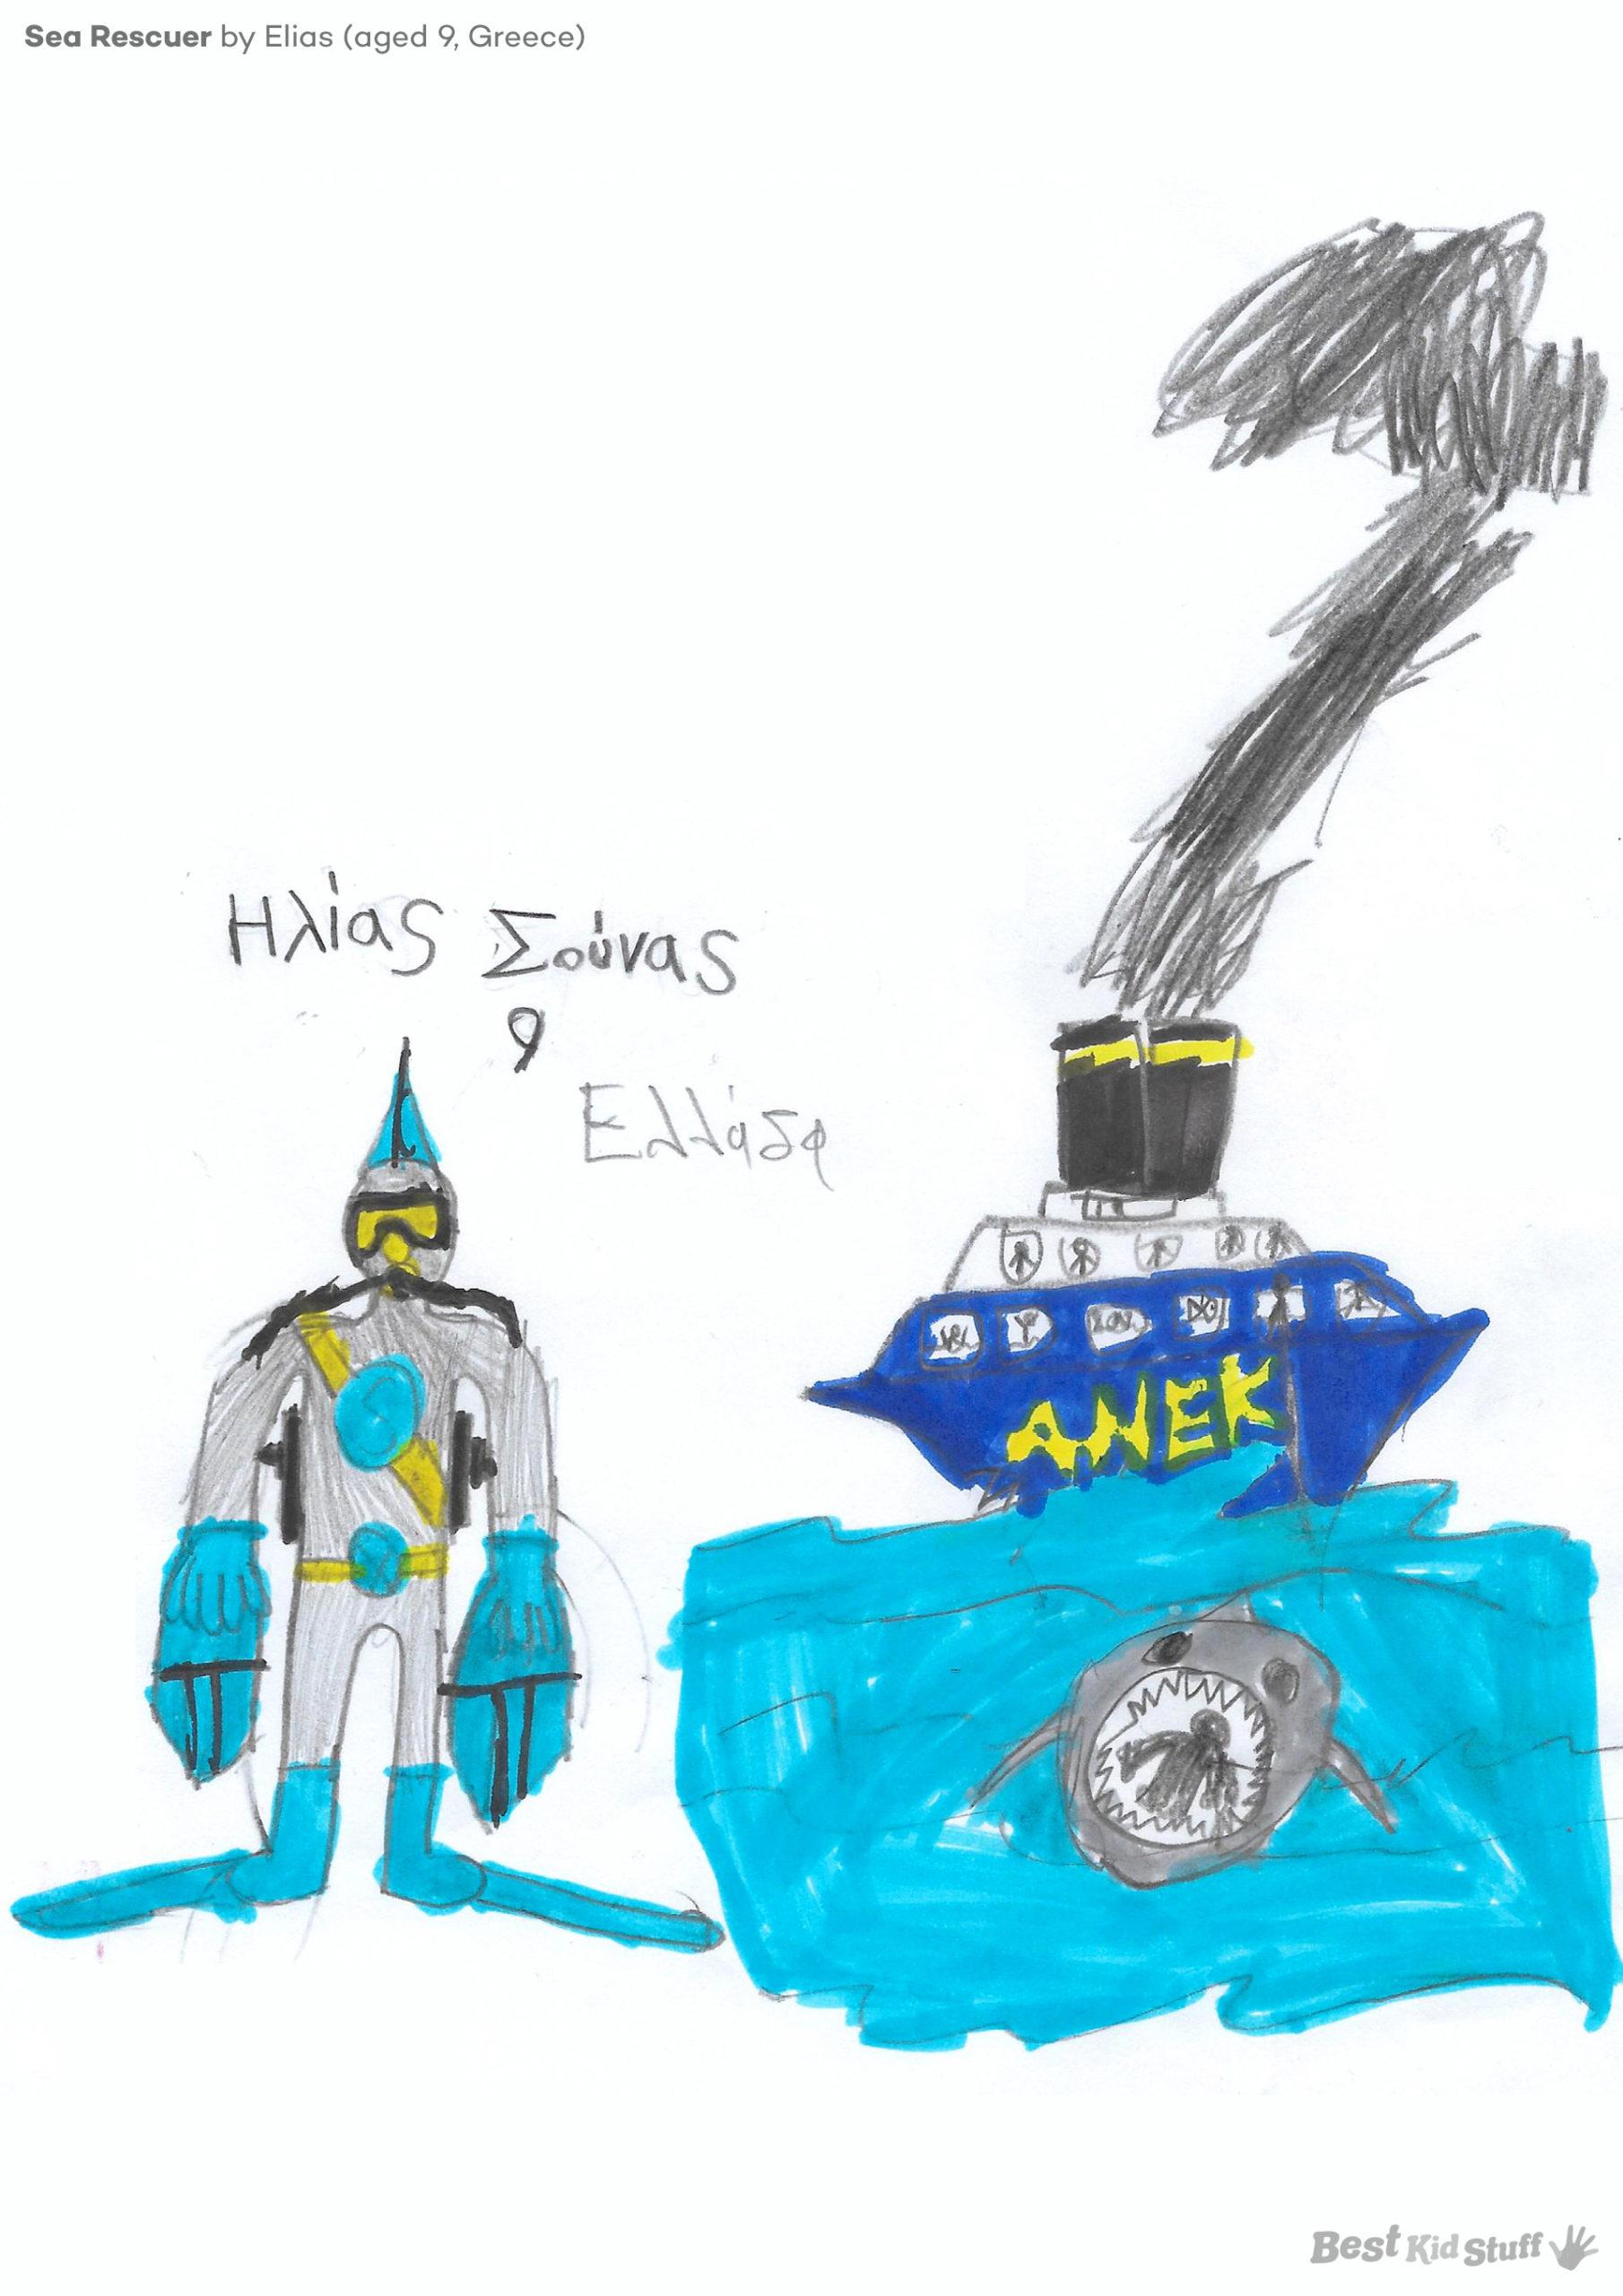 04 New League of Superheroes Sea Rescuer Original scaled